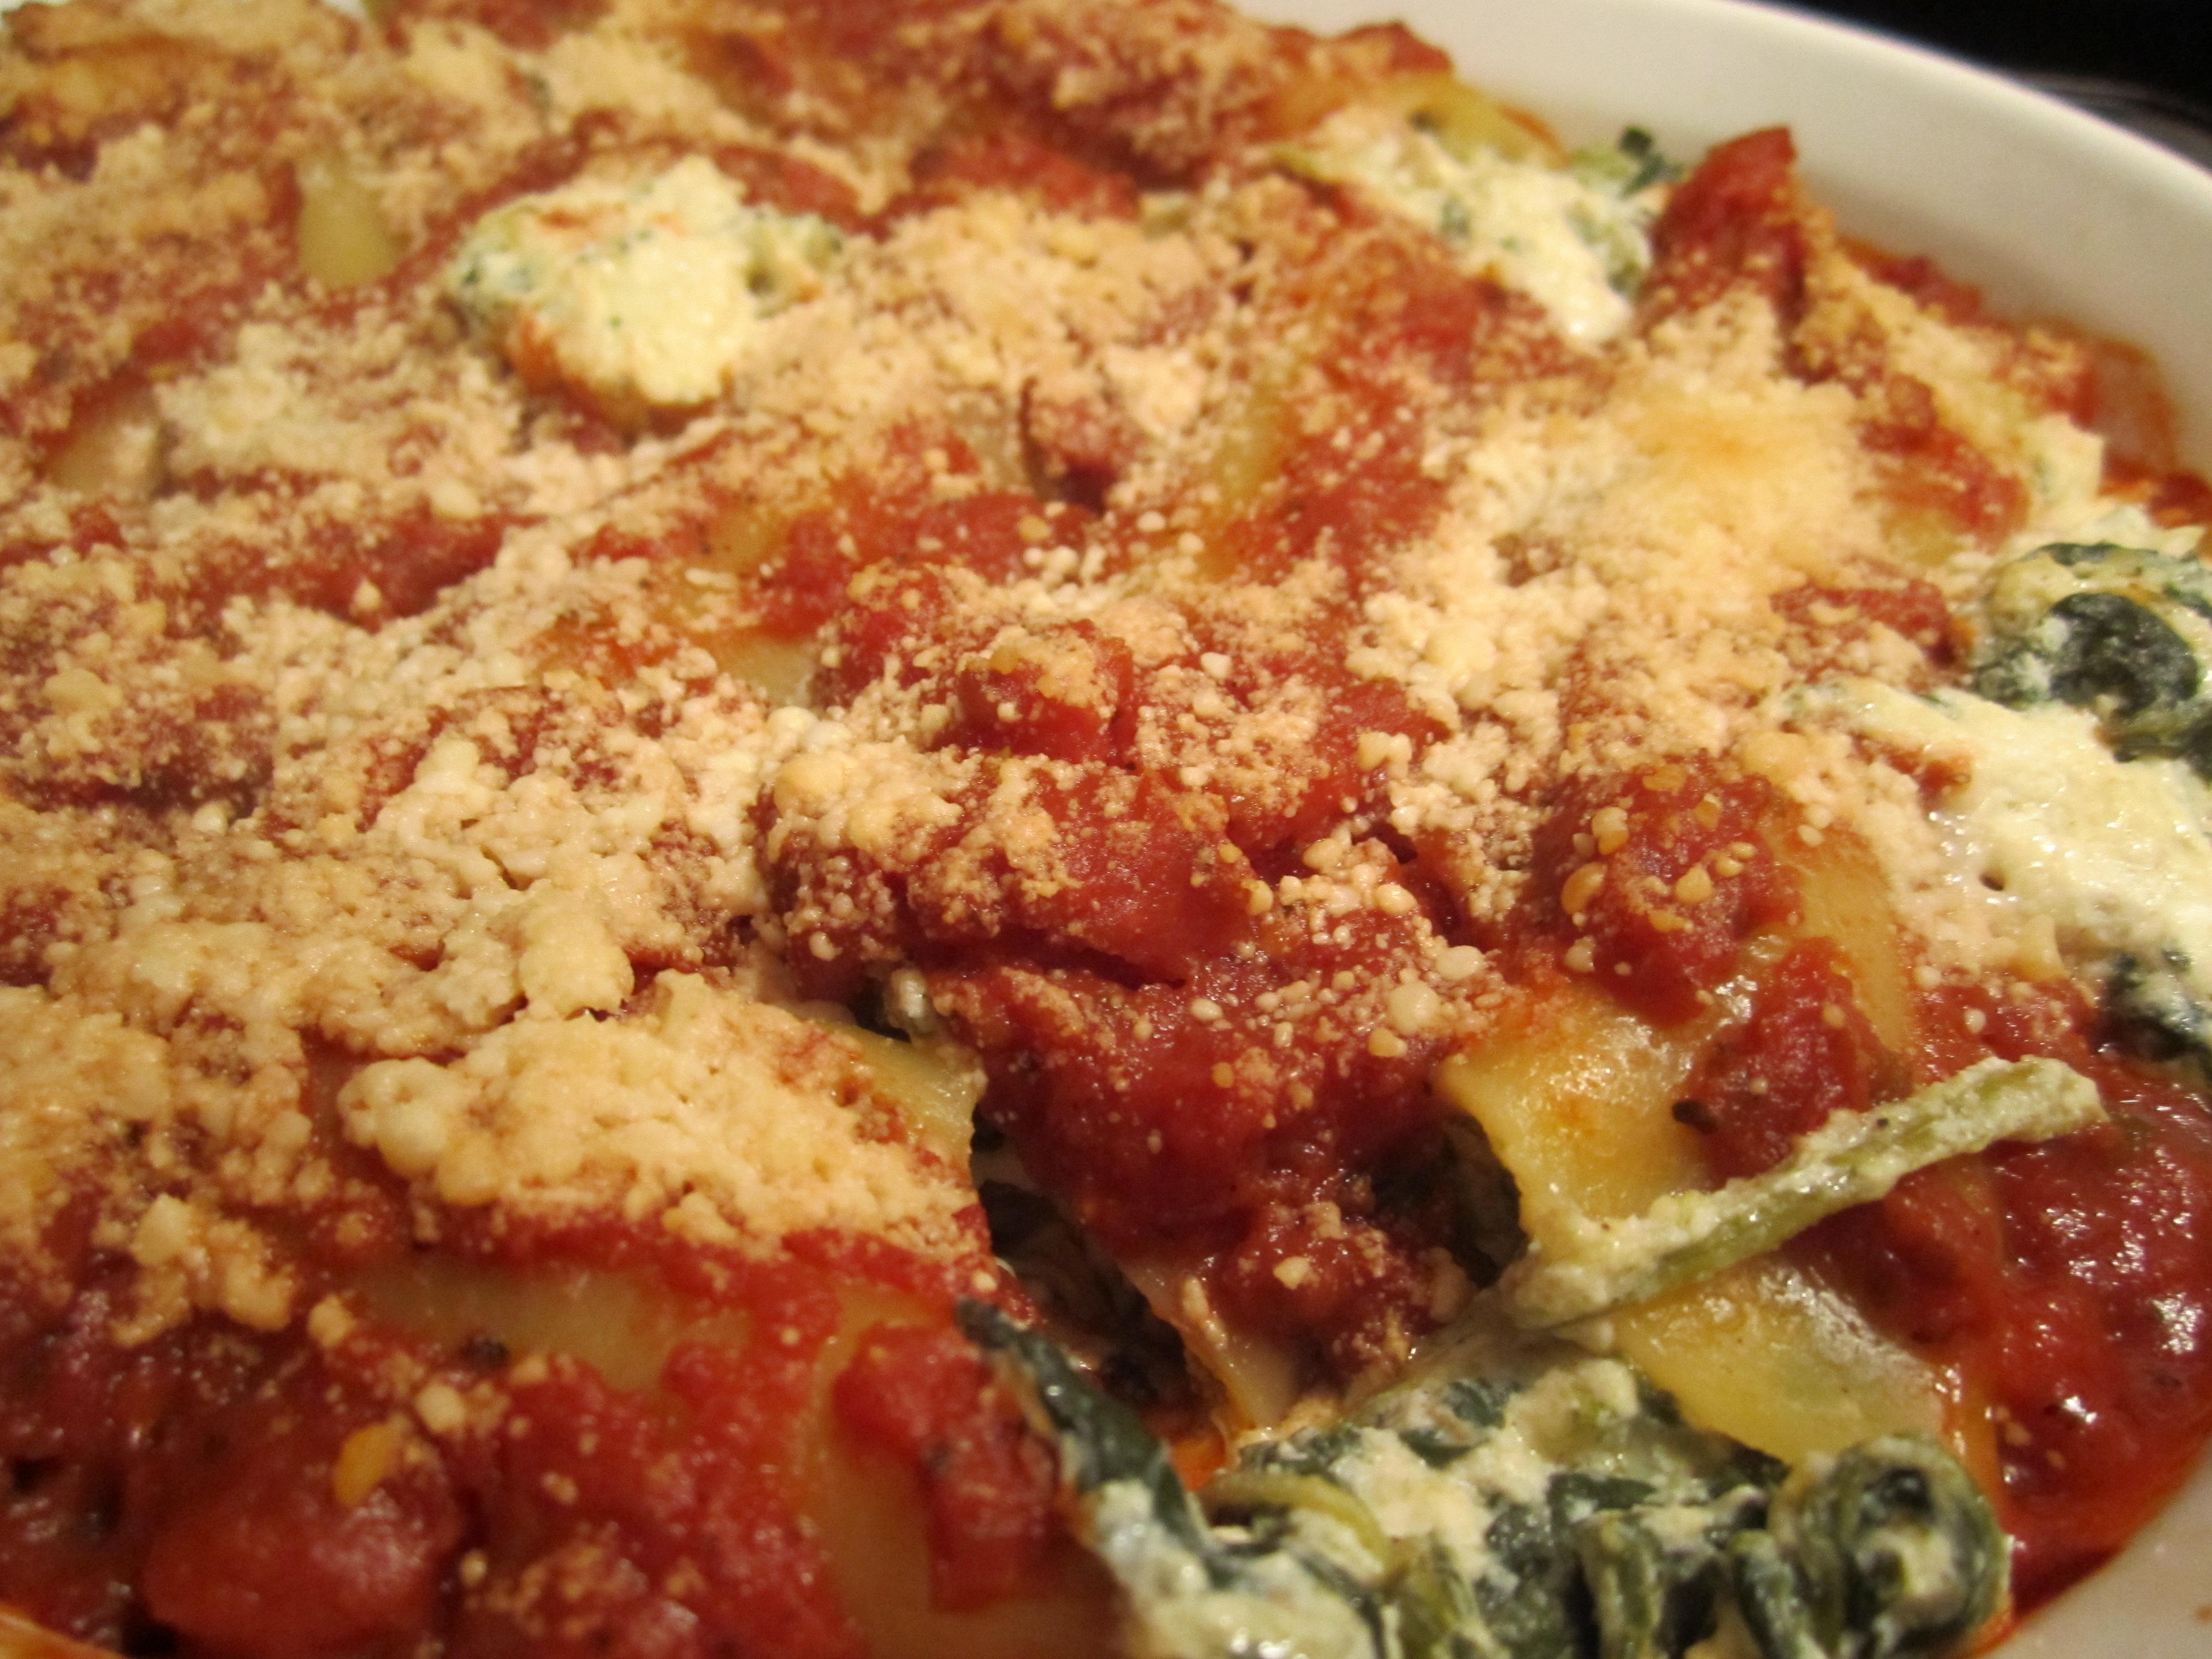 Manicotti recipes italiannius kitchen forumfinder Choice Image